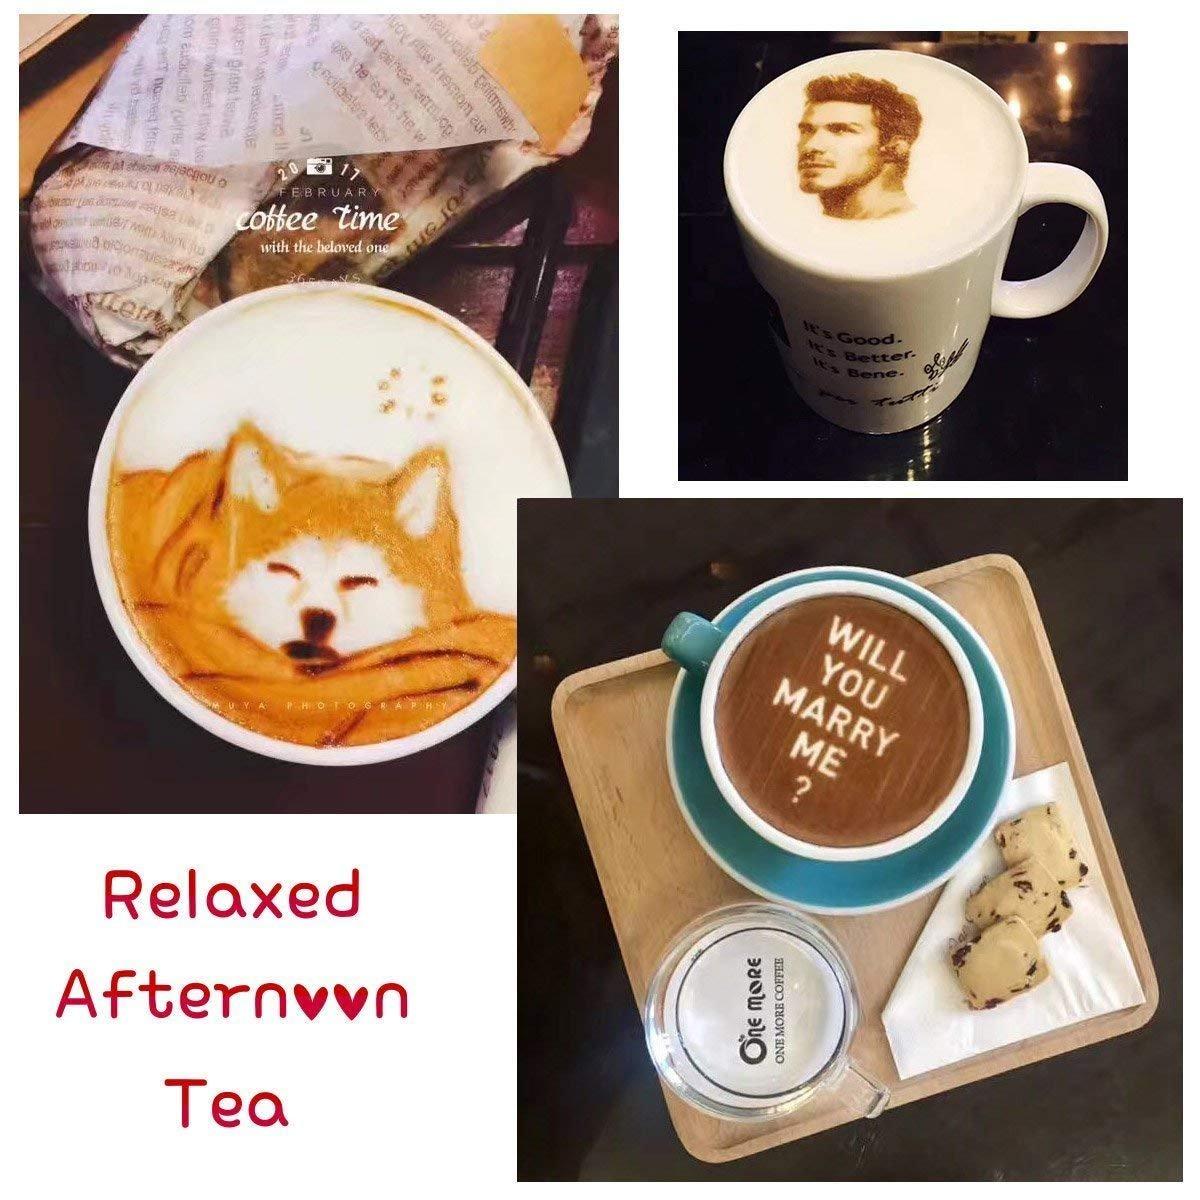 Impresora Mokka 3D Coffee, 2018 Upgrade 4 Tazas Latte Cake Selfie Impresora Artística Full Tinta Comestible automática Printe (Blanco): Amazon.es: Hogar